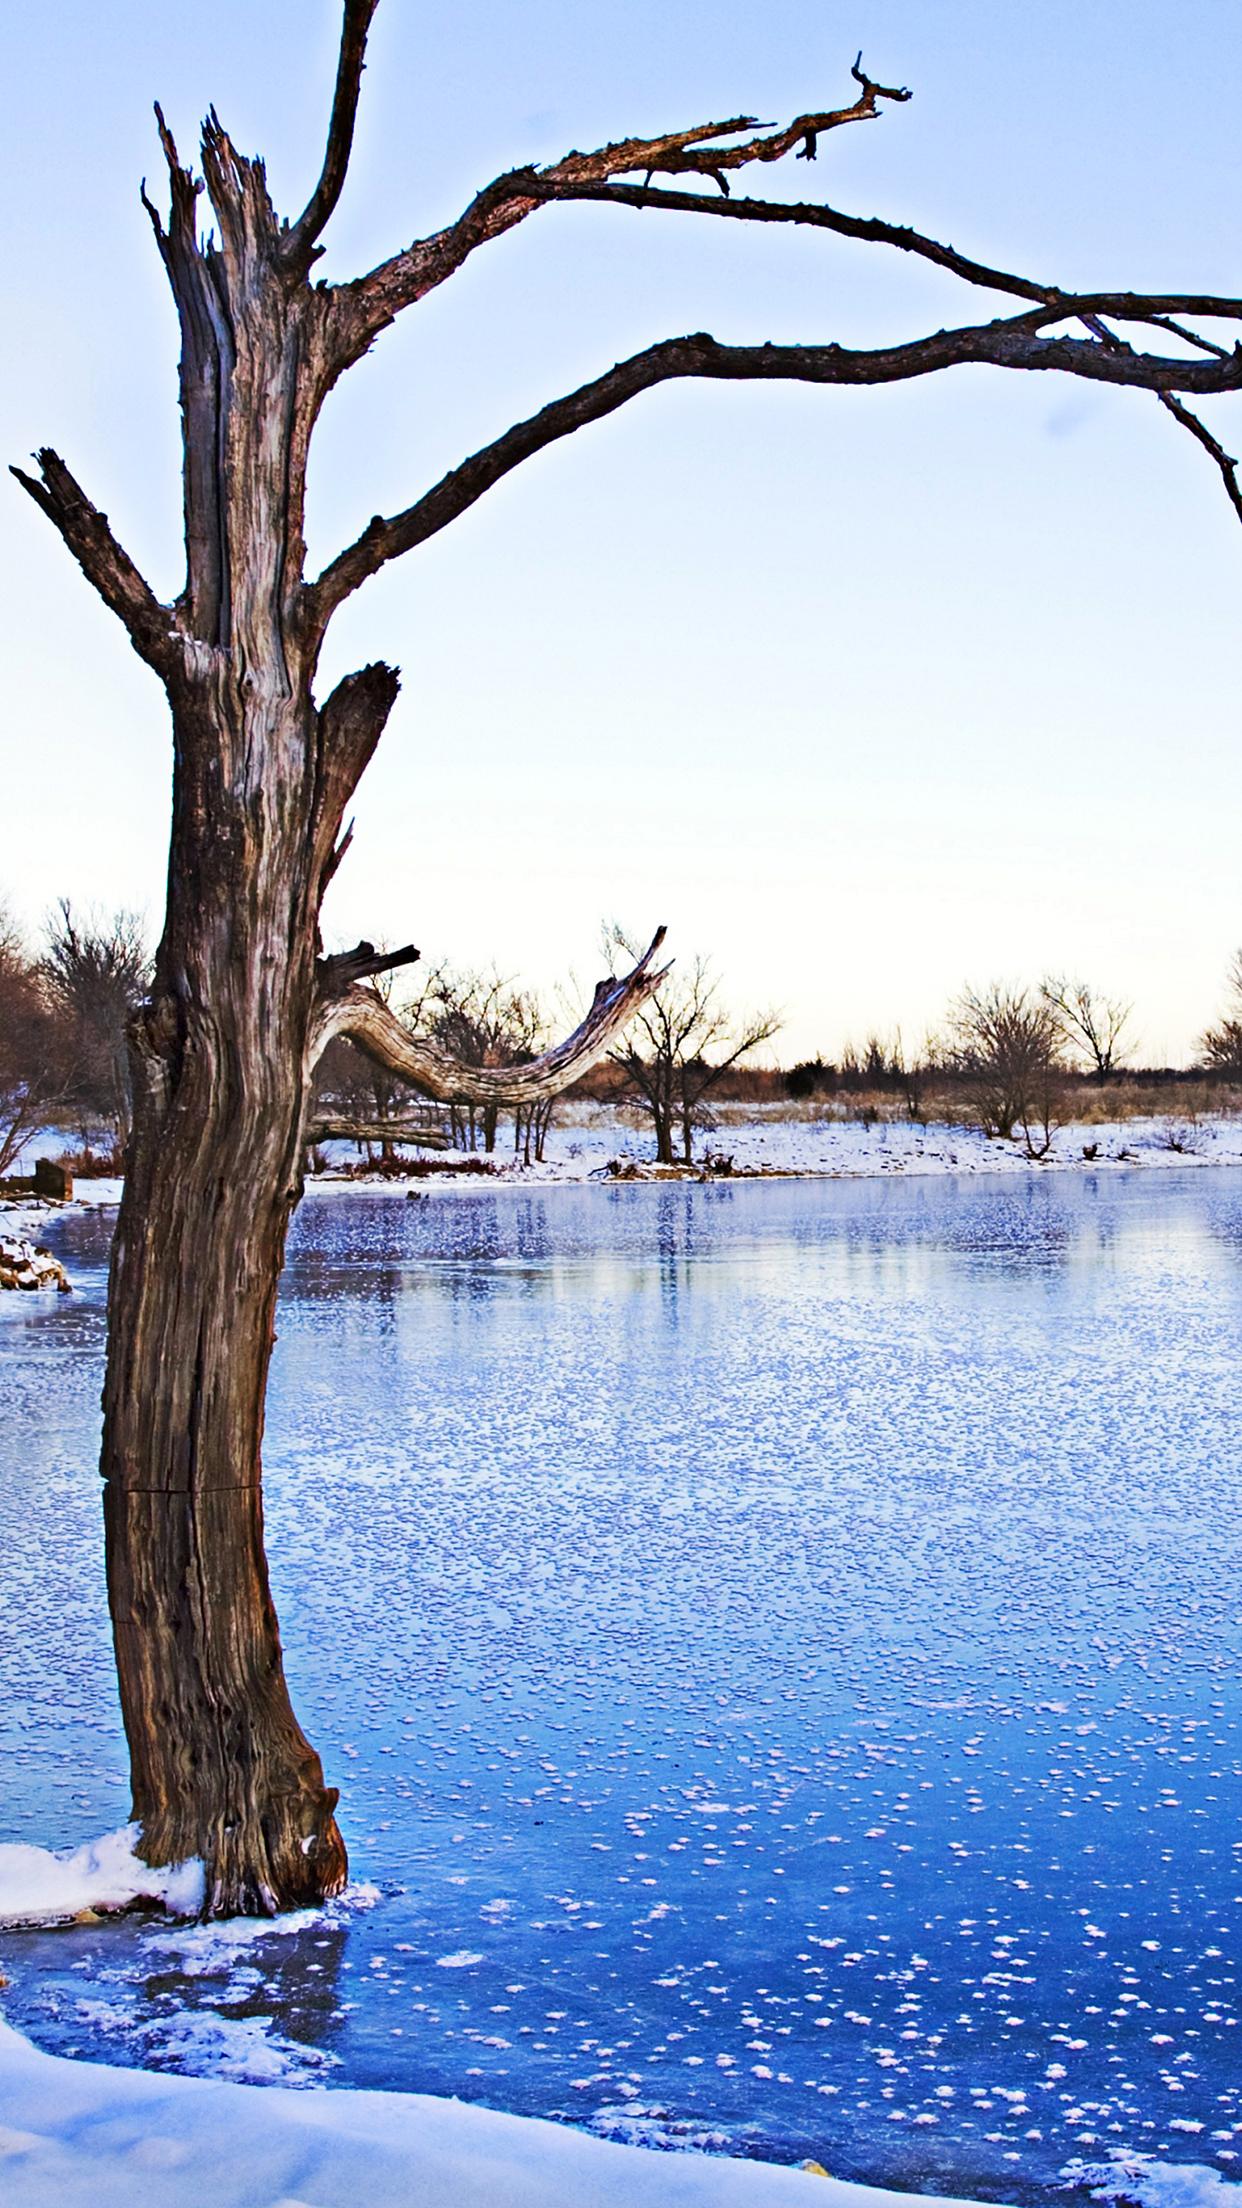 frozen lake 3wallpapers parallax iphone Frozen Lake